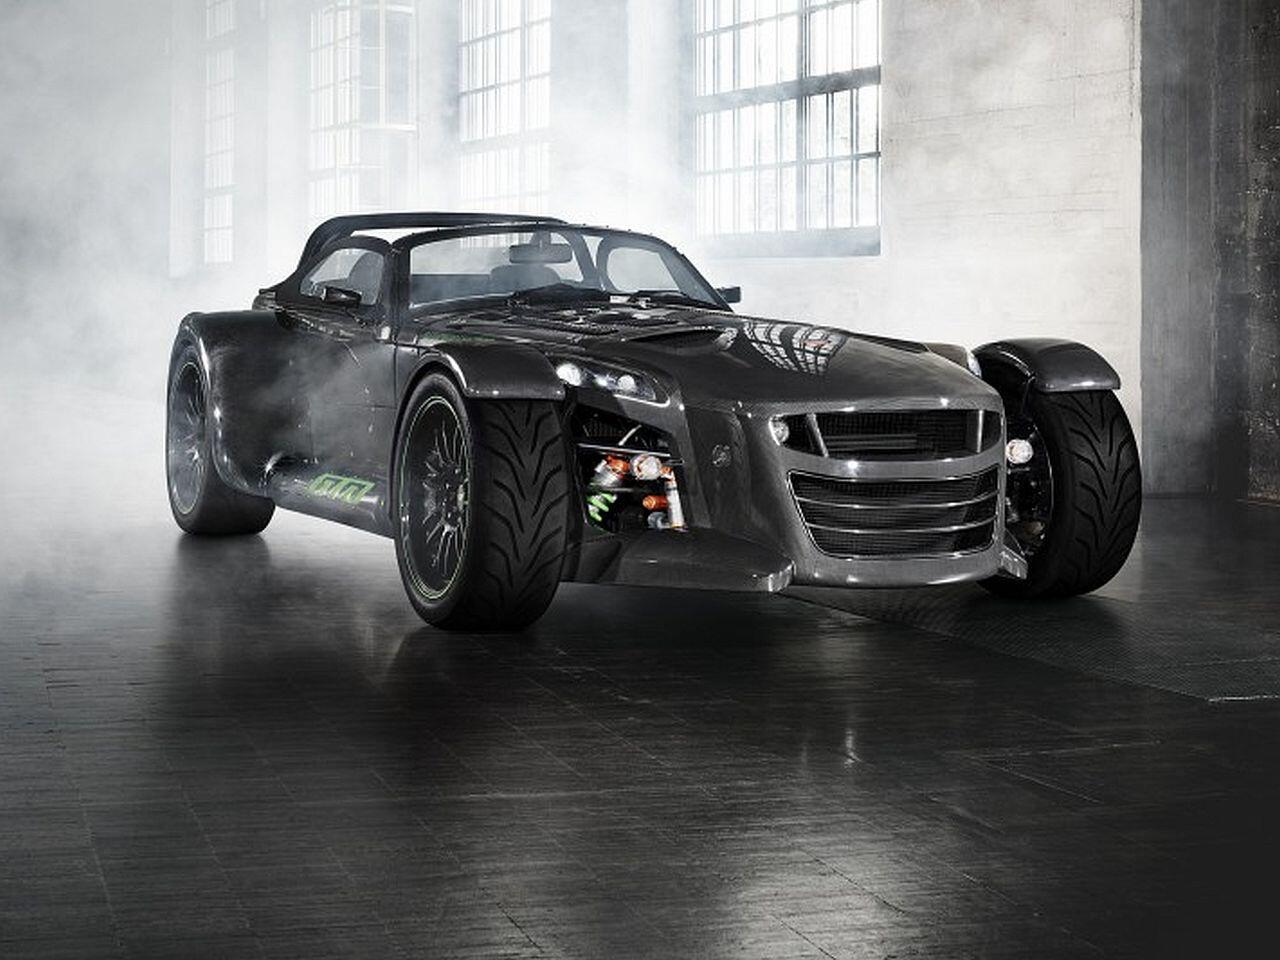 Bild zu Donkervoort GTO Bare Naked Carbon Edition